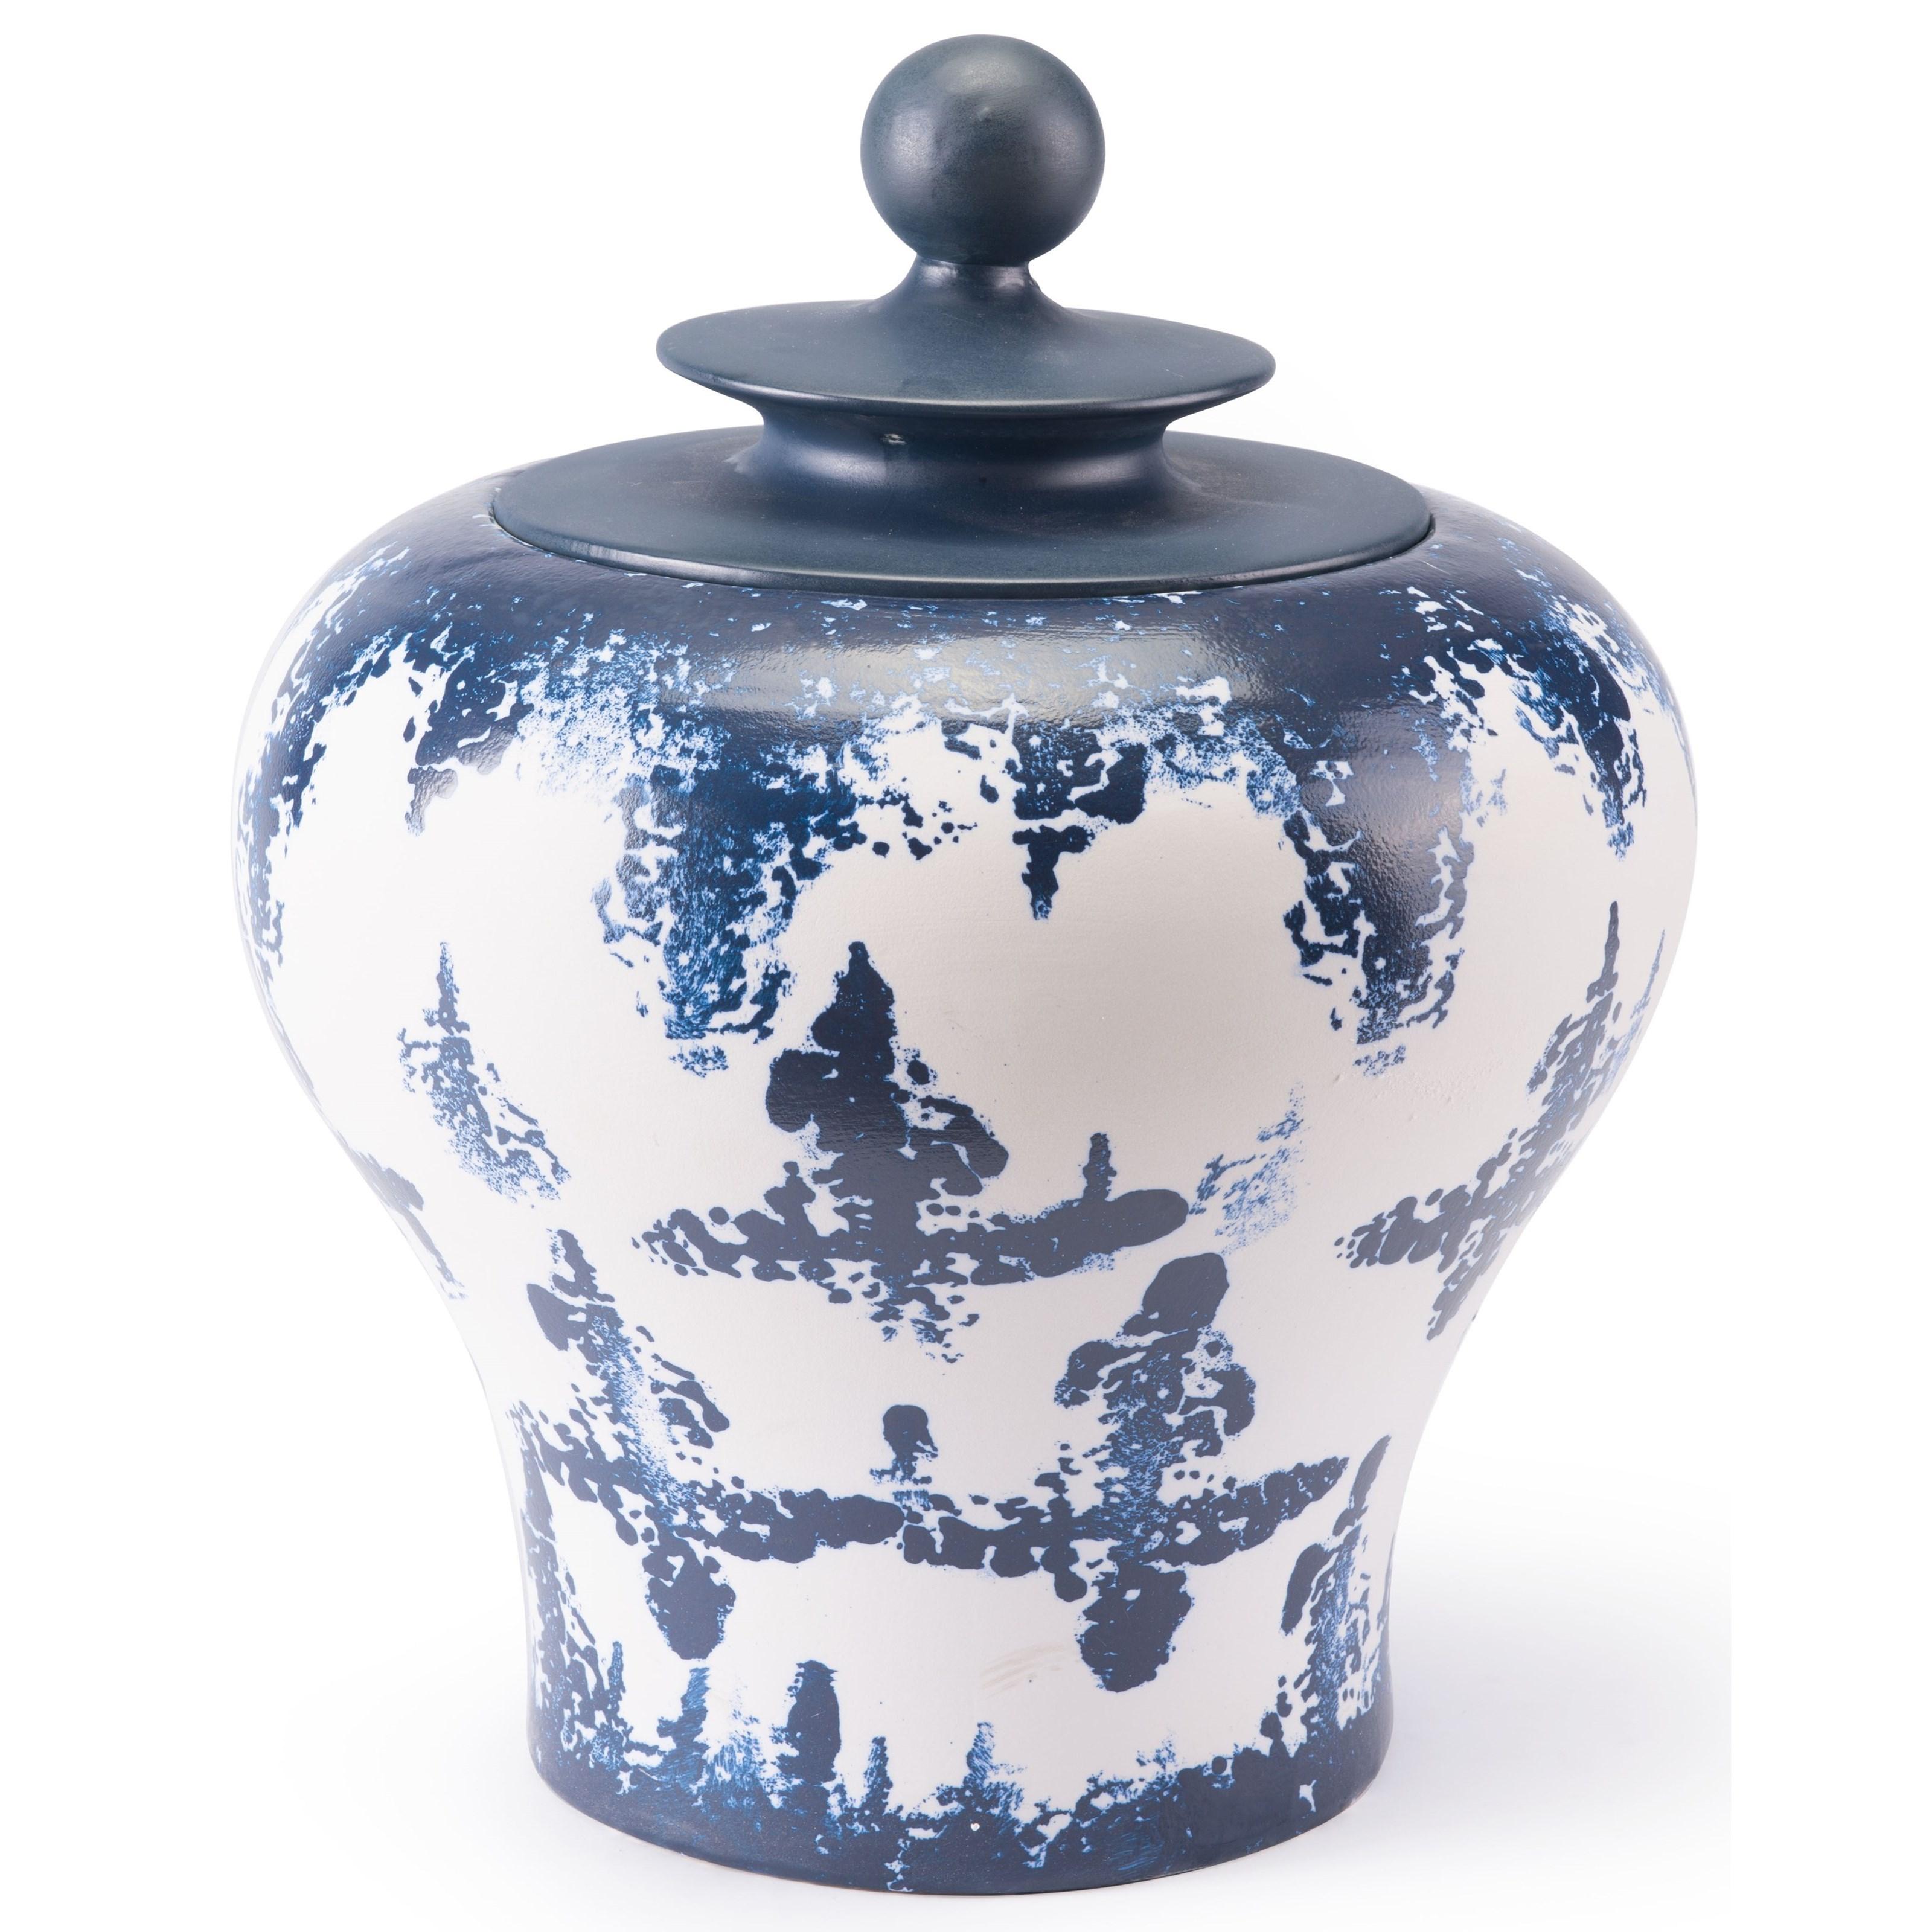 Zuo Bottles and Jars Mar Medium Temple Jar - Item Number: A10299